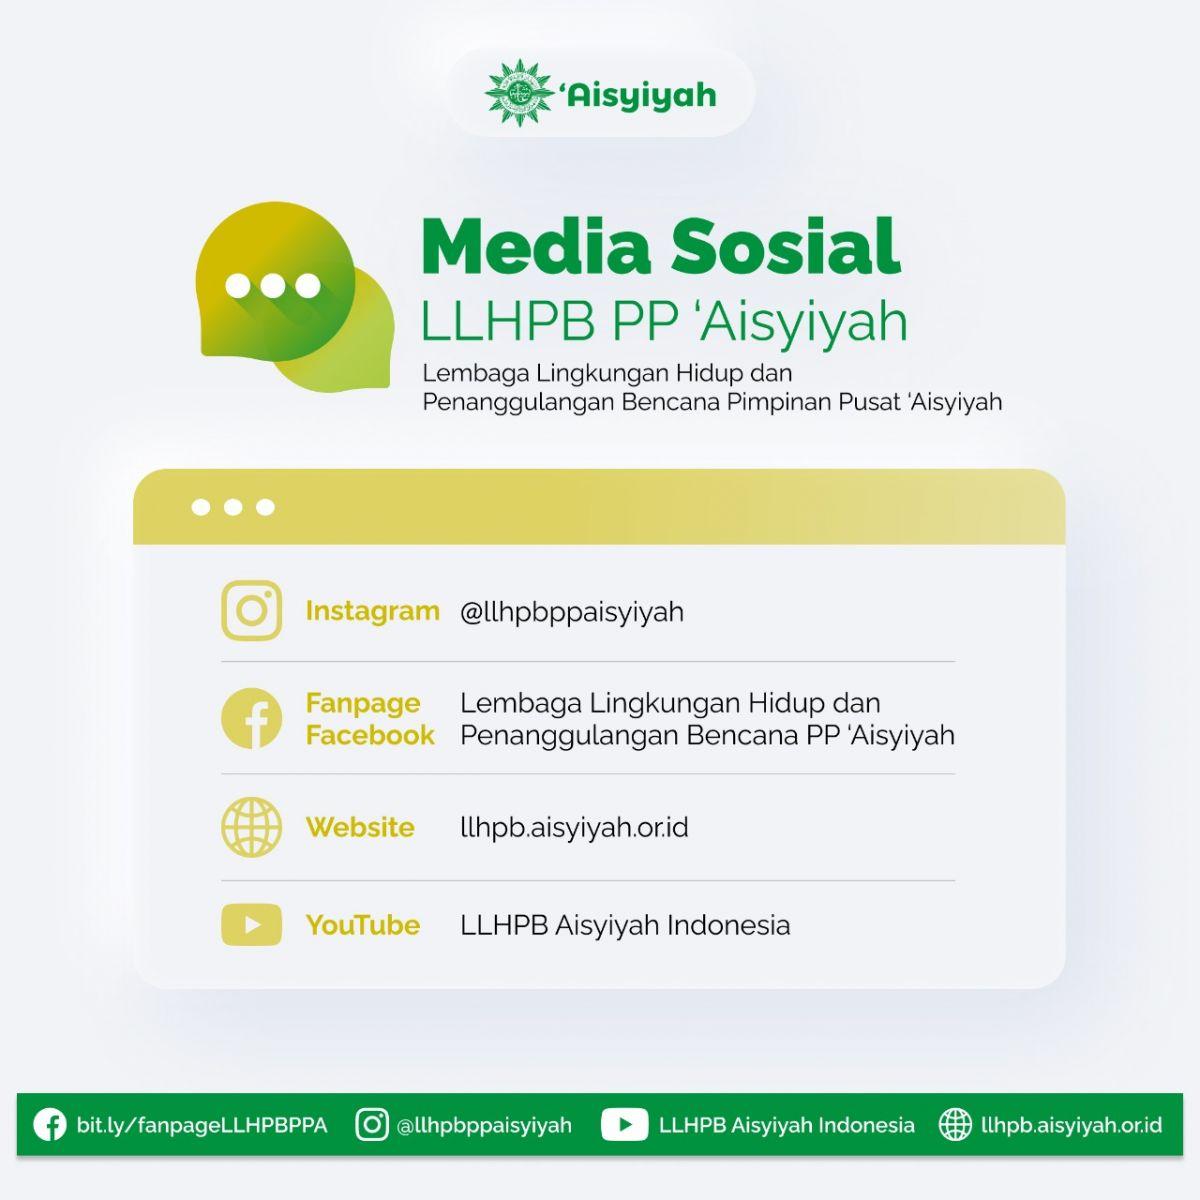 Media Sosial LLHPB PP 'Aisyiyah  Mari kita cek dan ikuti (follow) akun-akun media sosial LLHPB PP 'Aisyiyah berikut ini:  - Instagram: https://www.instagram.com/llhpbppaisyiyah/  - Fanpage Facebook : https://bit.ly/fanpageLLHPBPPA  - Website/ Sistim Informasi Aisyiyah (SIA) : http://llhpb.aisyiyah.or.id/  - Youtube: http://bit.ly/youtubeLLHPBPPA   #Aisyiyah #LLHPB